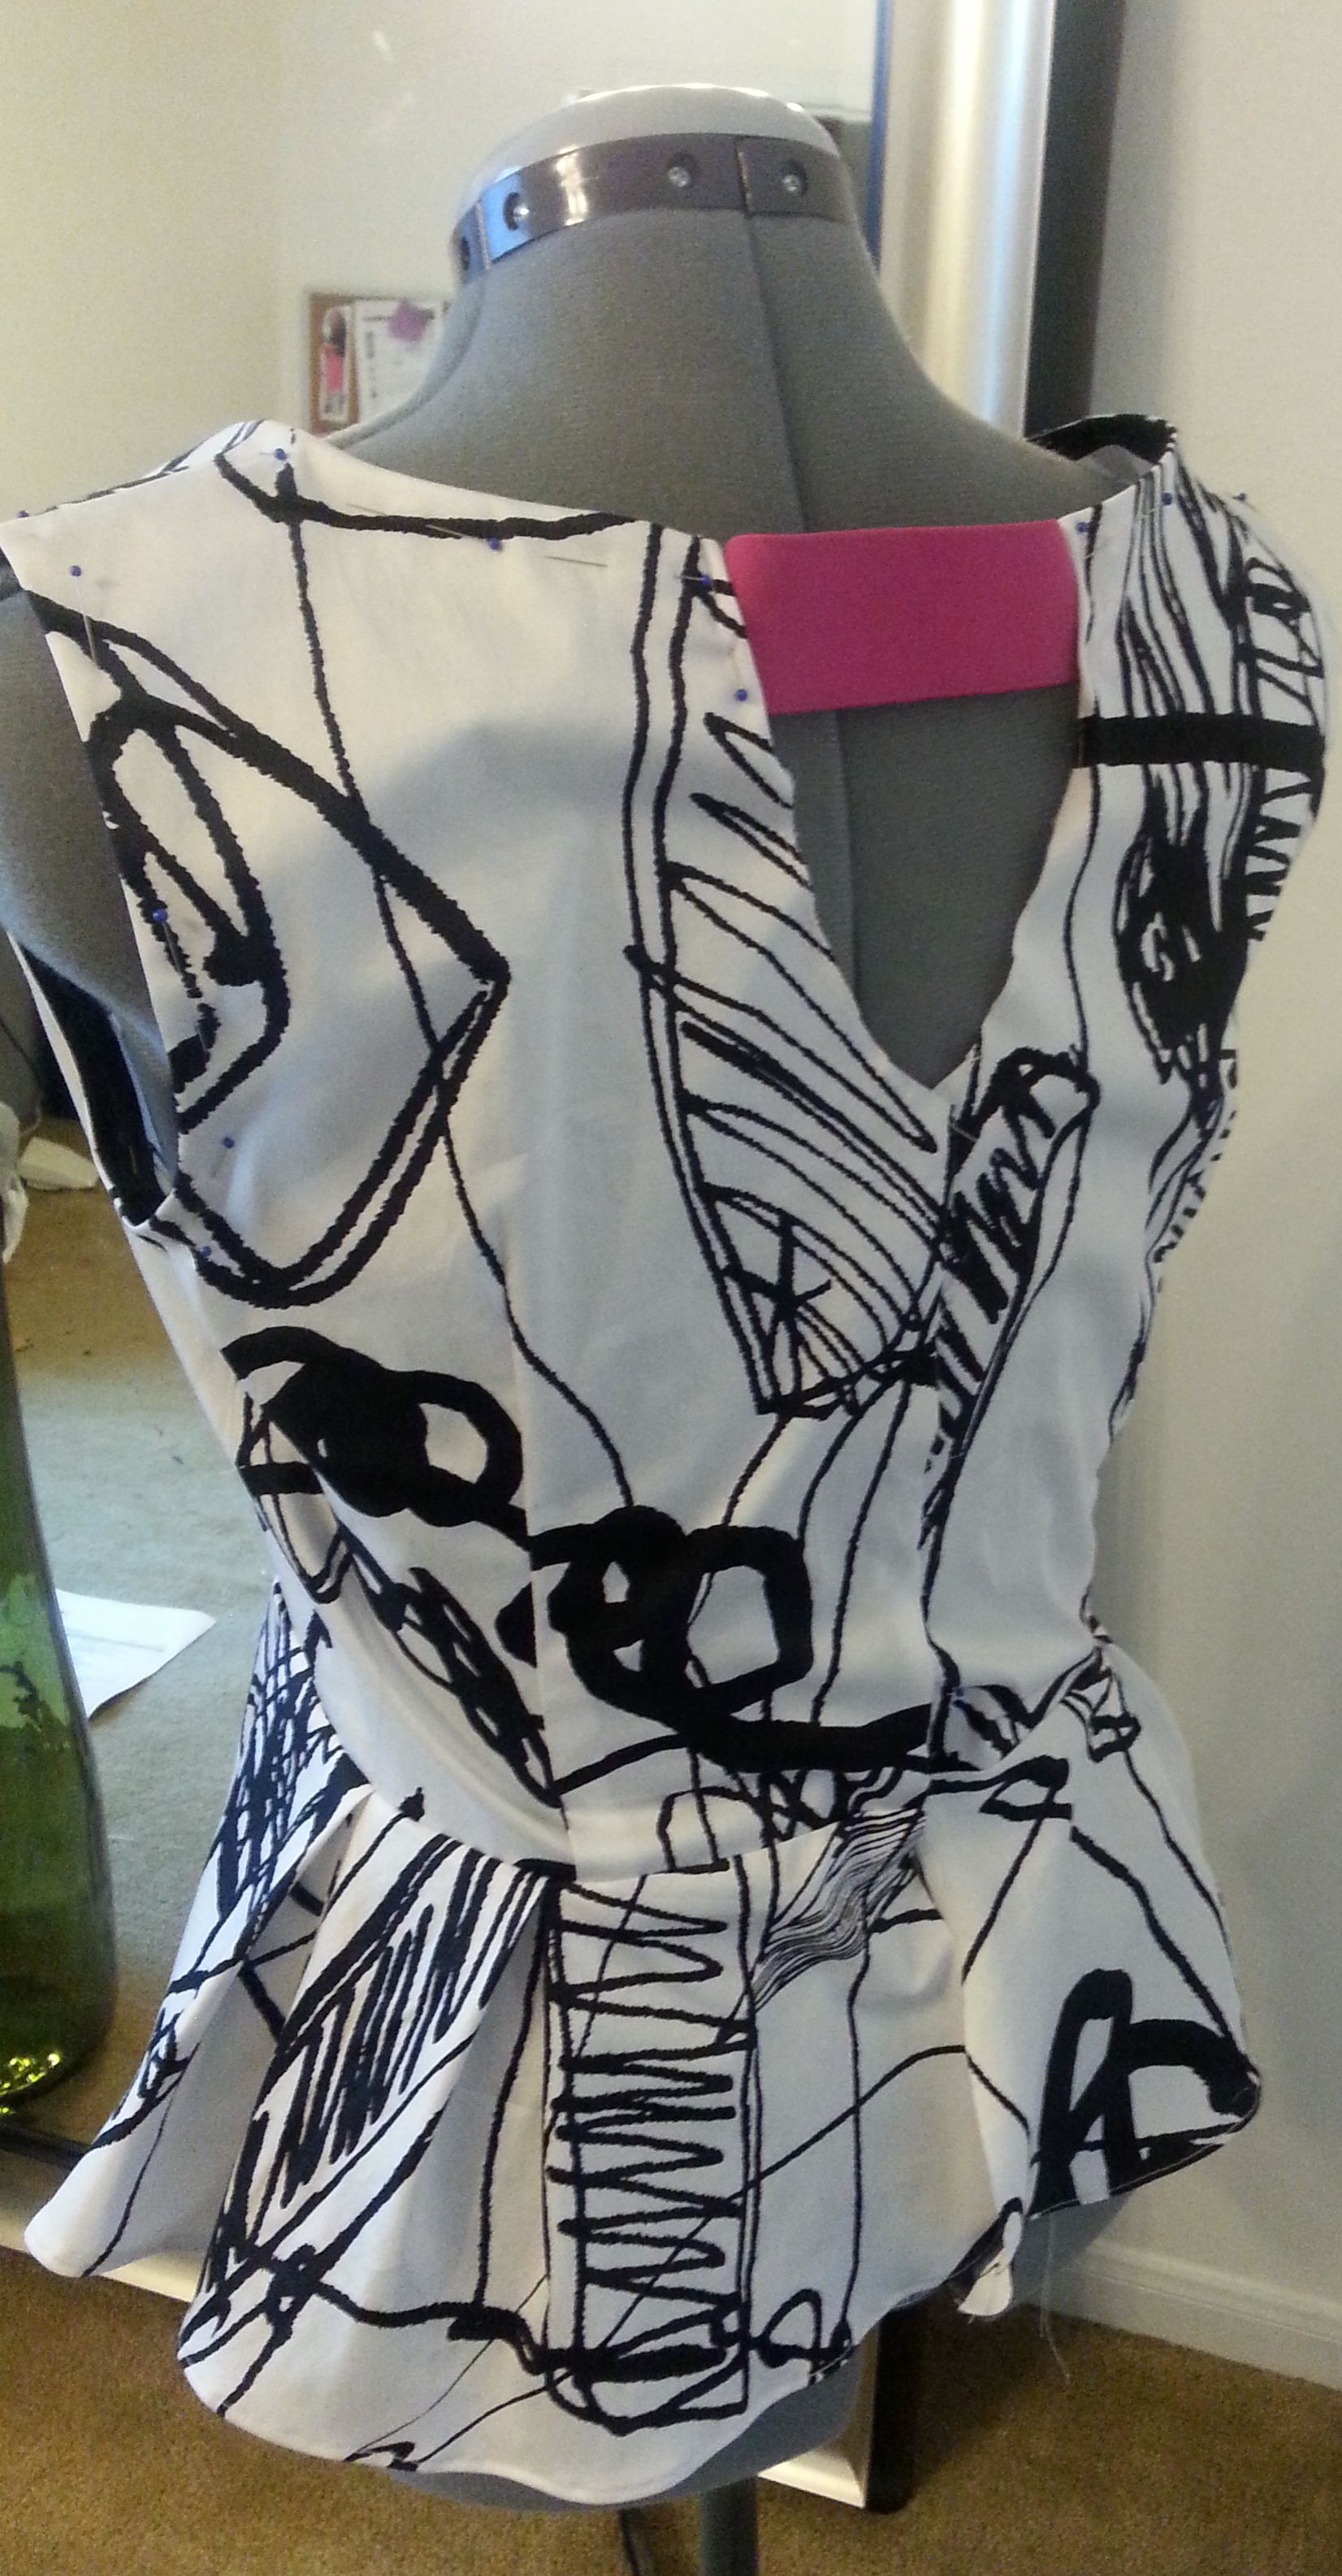 Here's the back of peplum prior to hemming, pressing, top stitching, adding zipper etc.